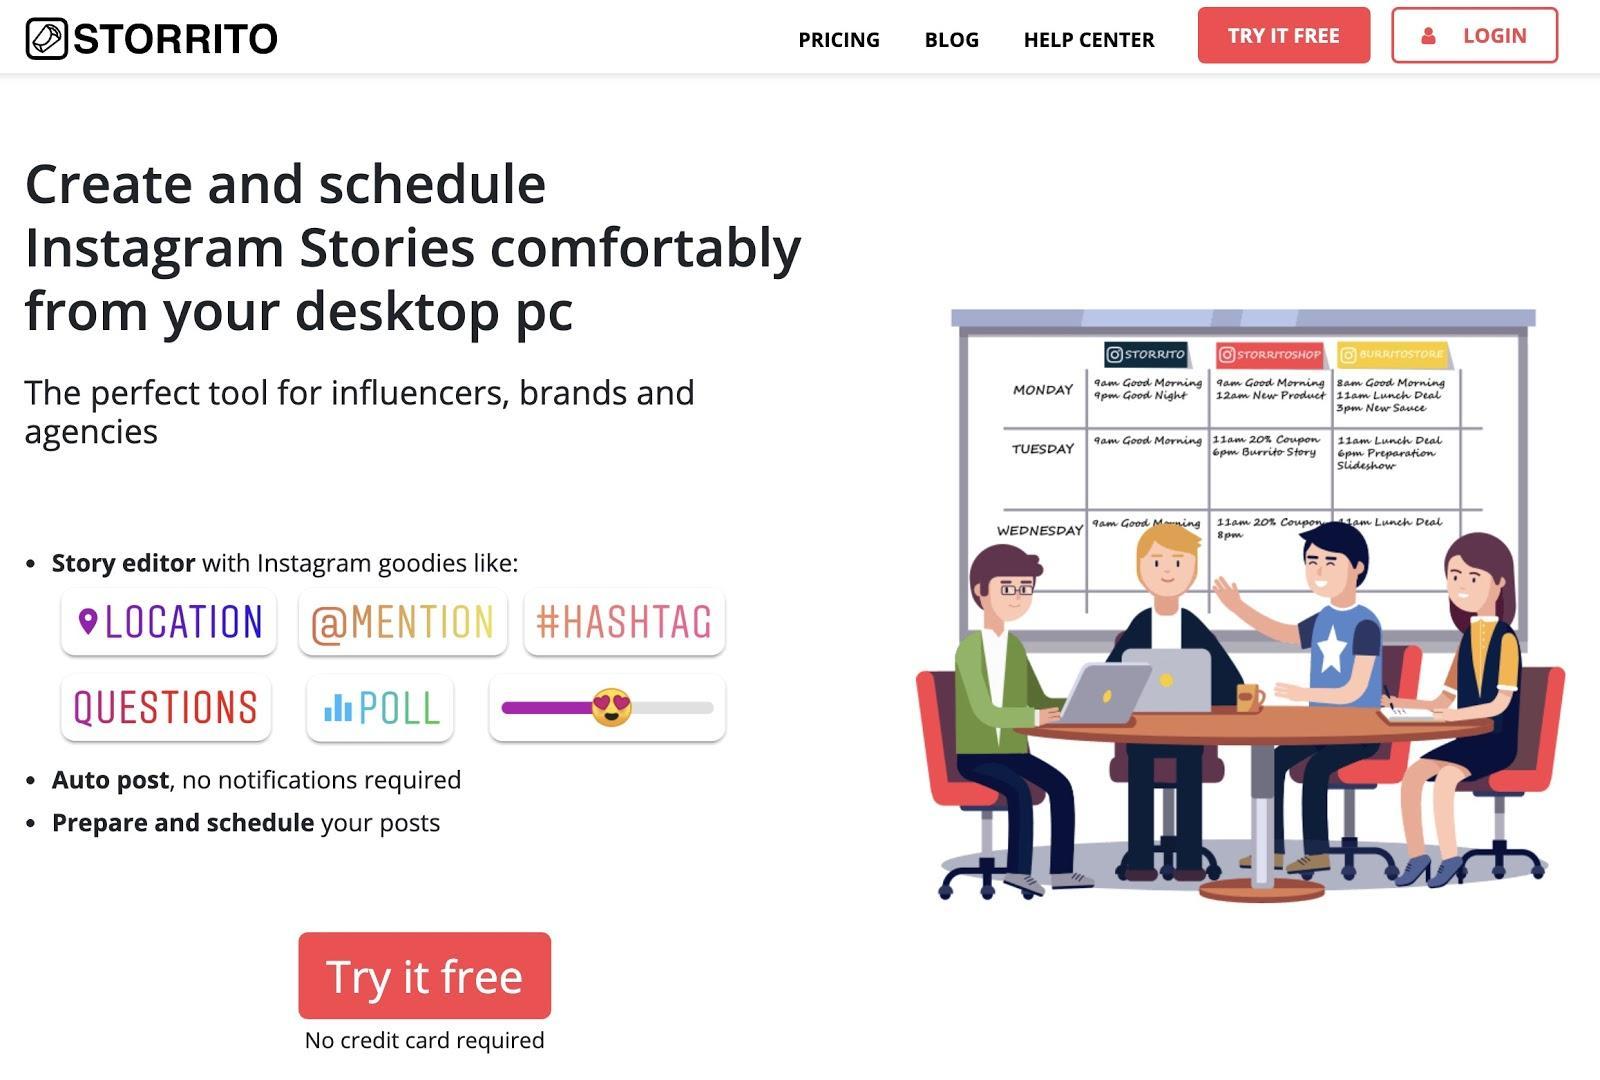 landing page of storrito.com